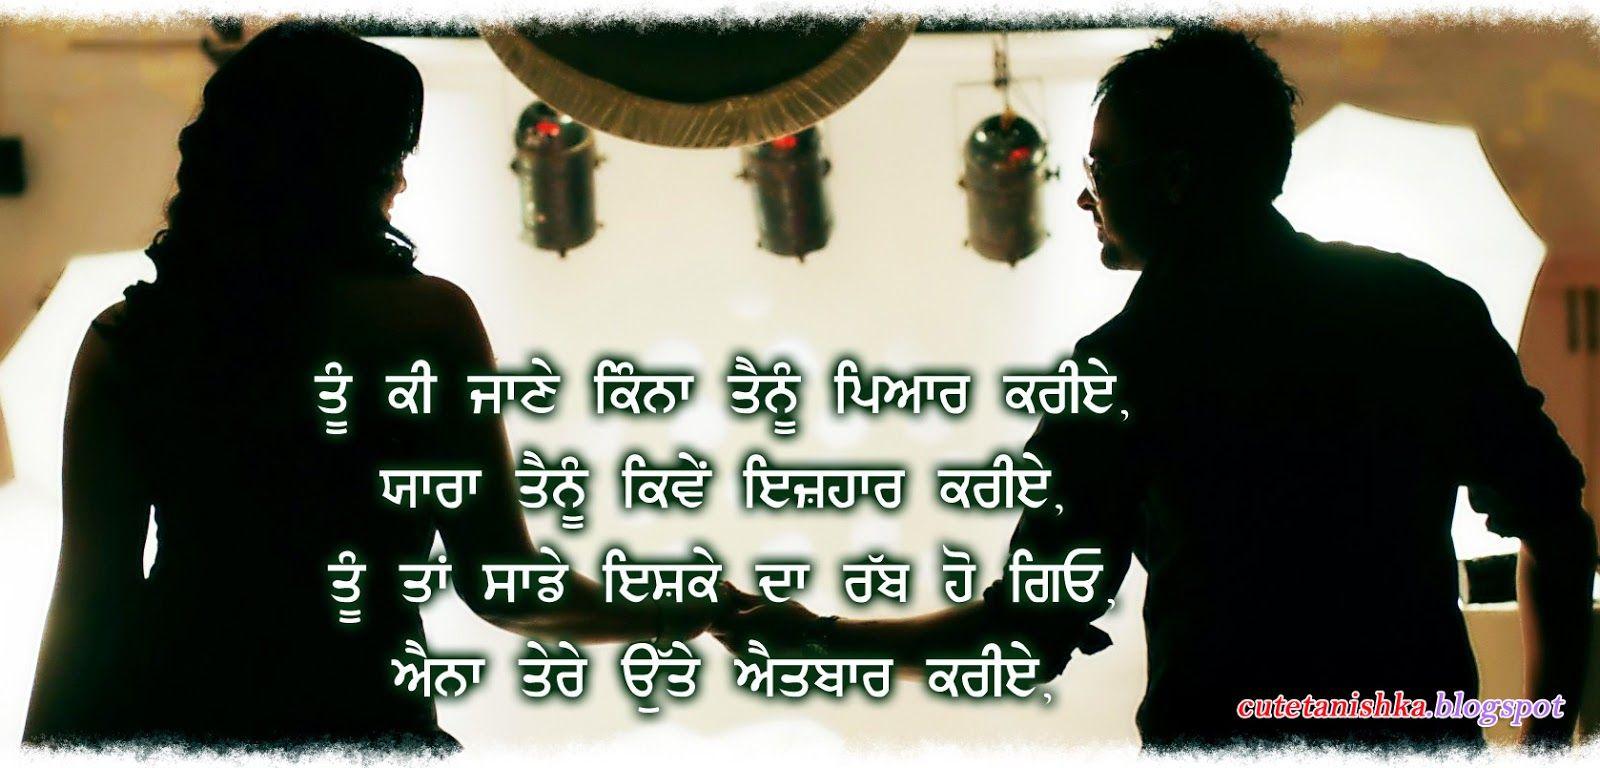 Great Wallpaper Love Punjabi - 07ec3b43cff71245534bde9e6efa5883  Image_1001725.jpg